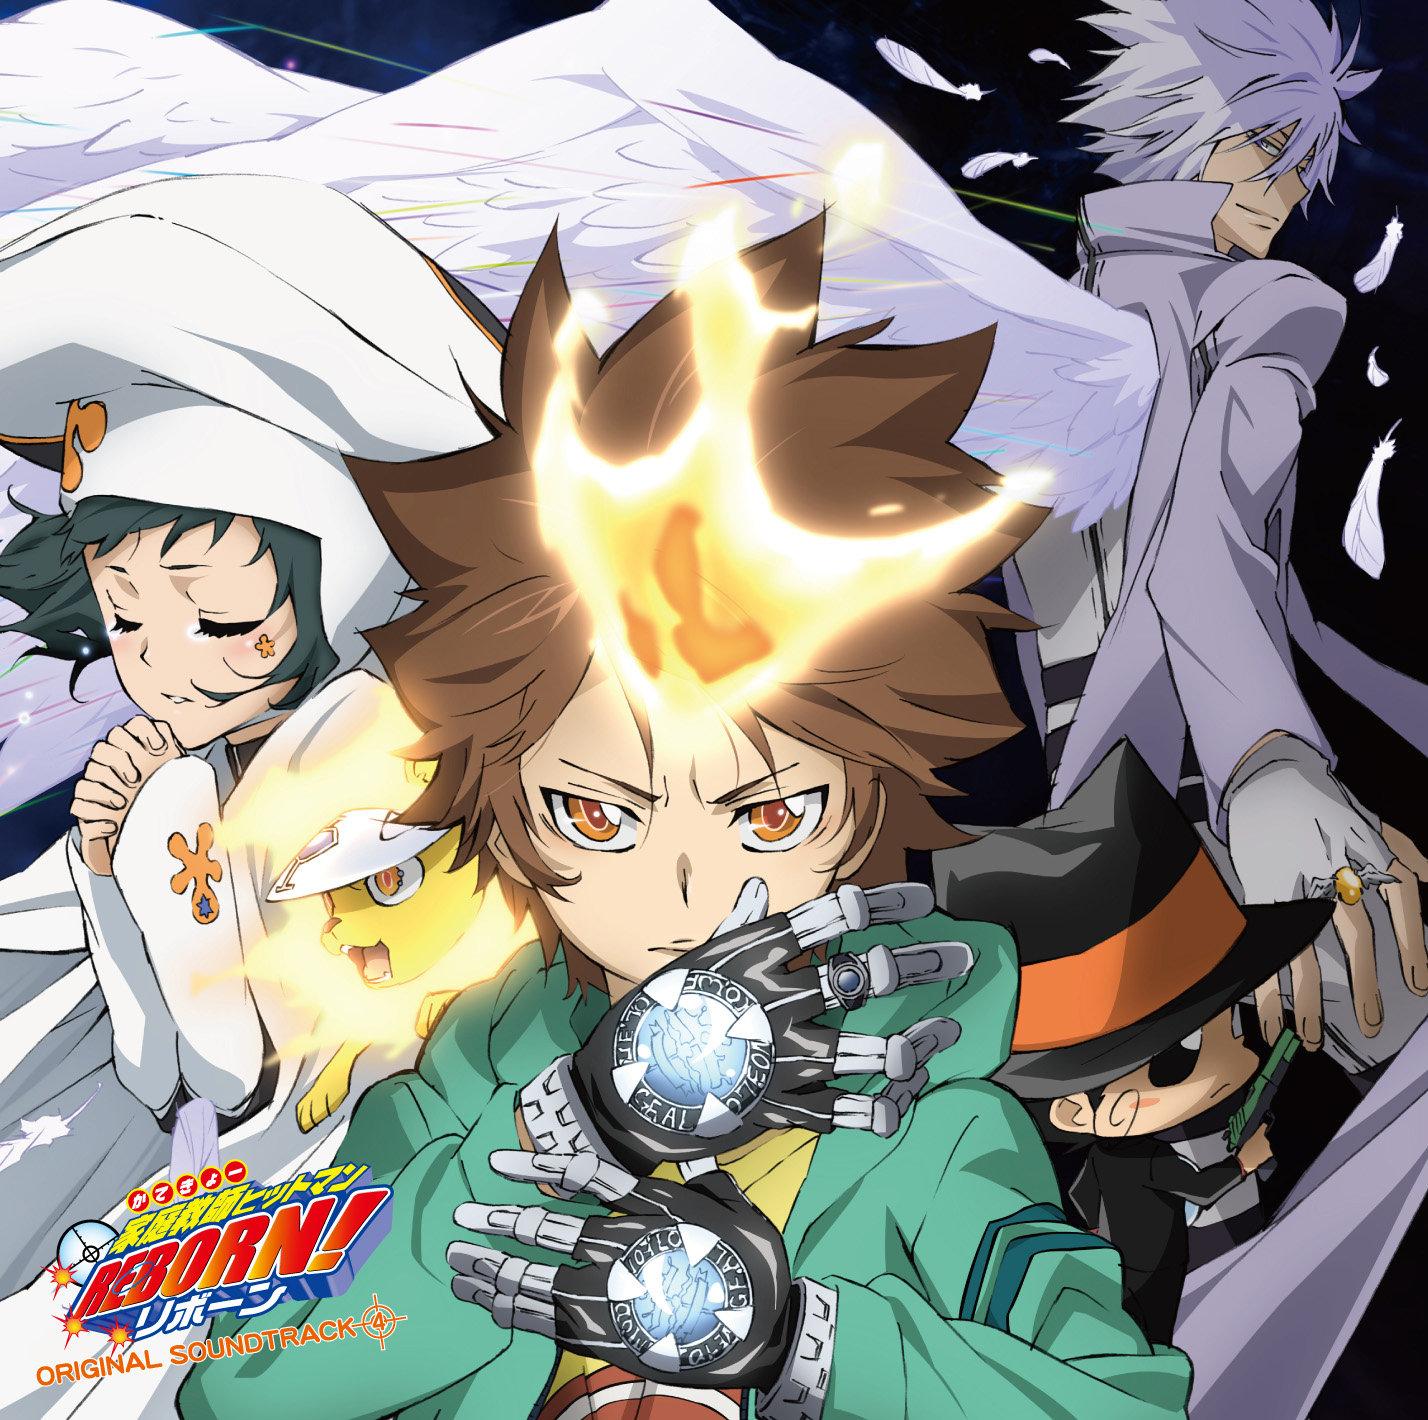 Katekyō Hitman Reborn! Original Soundtrack Target 4